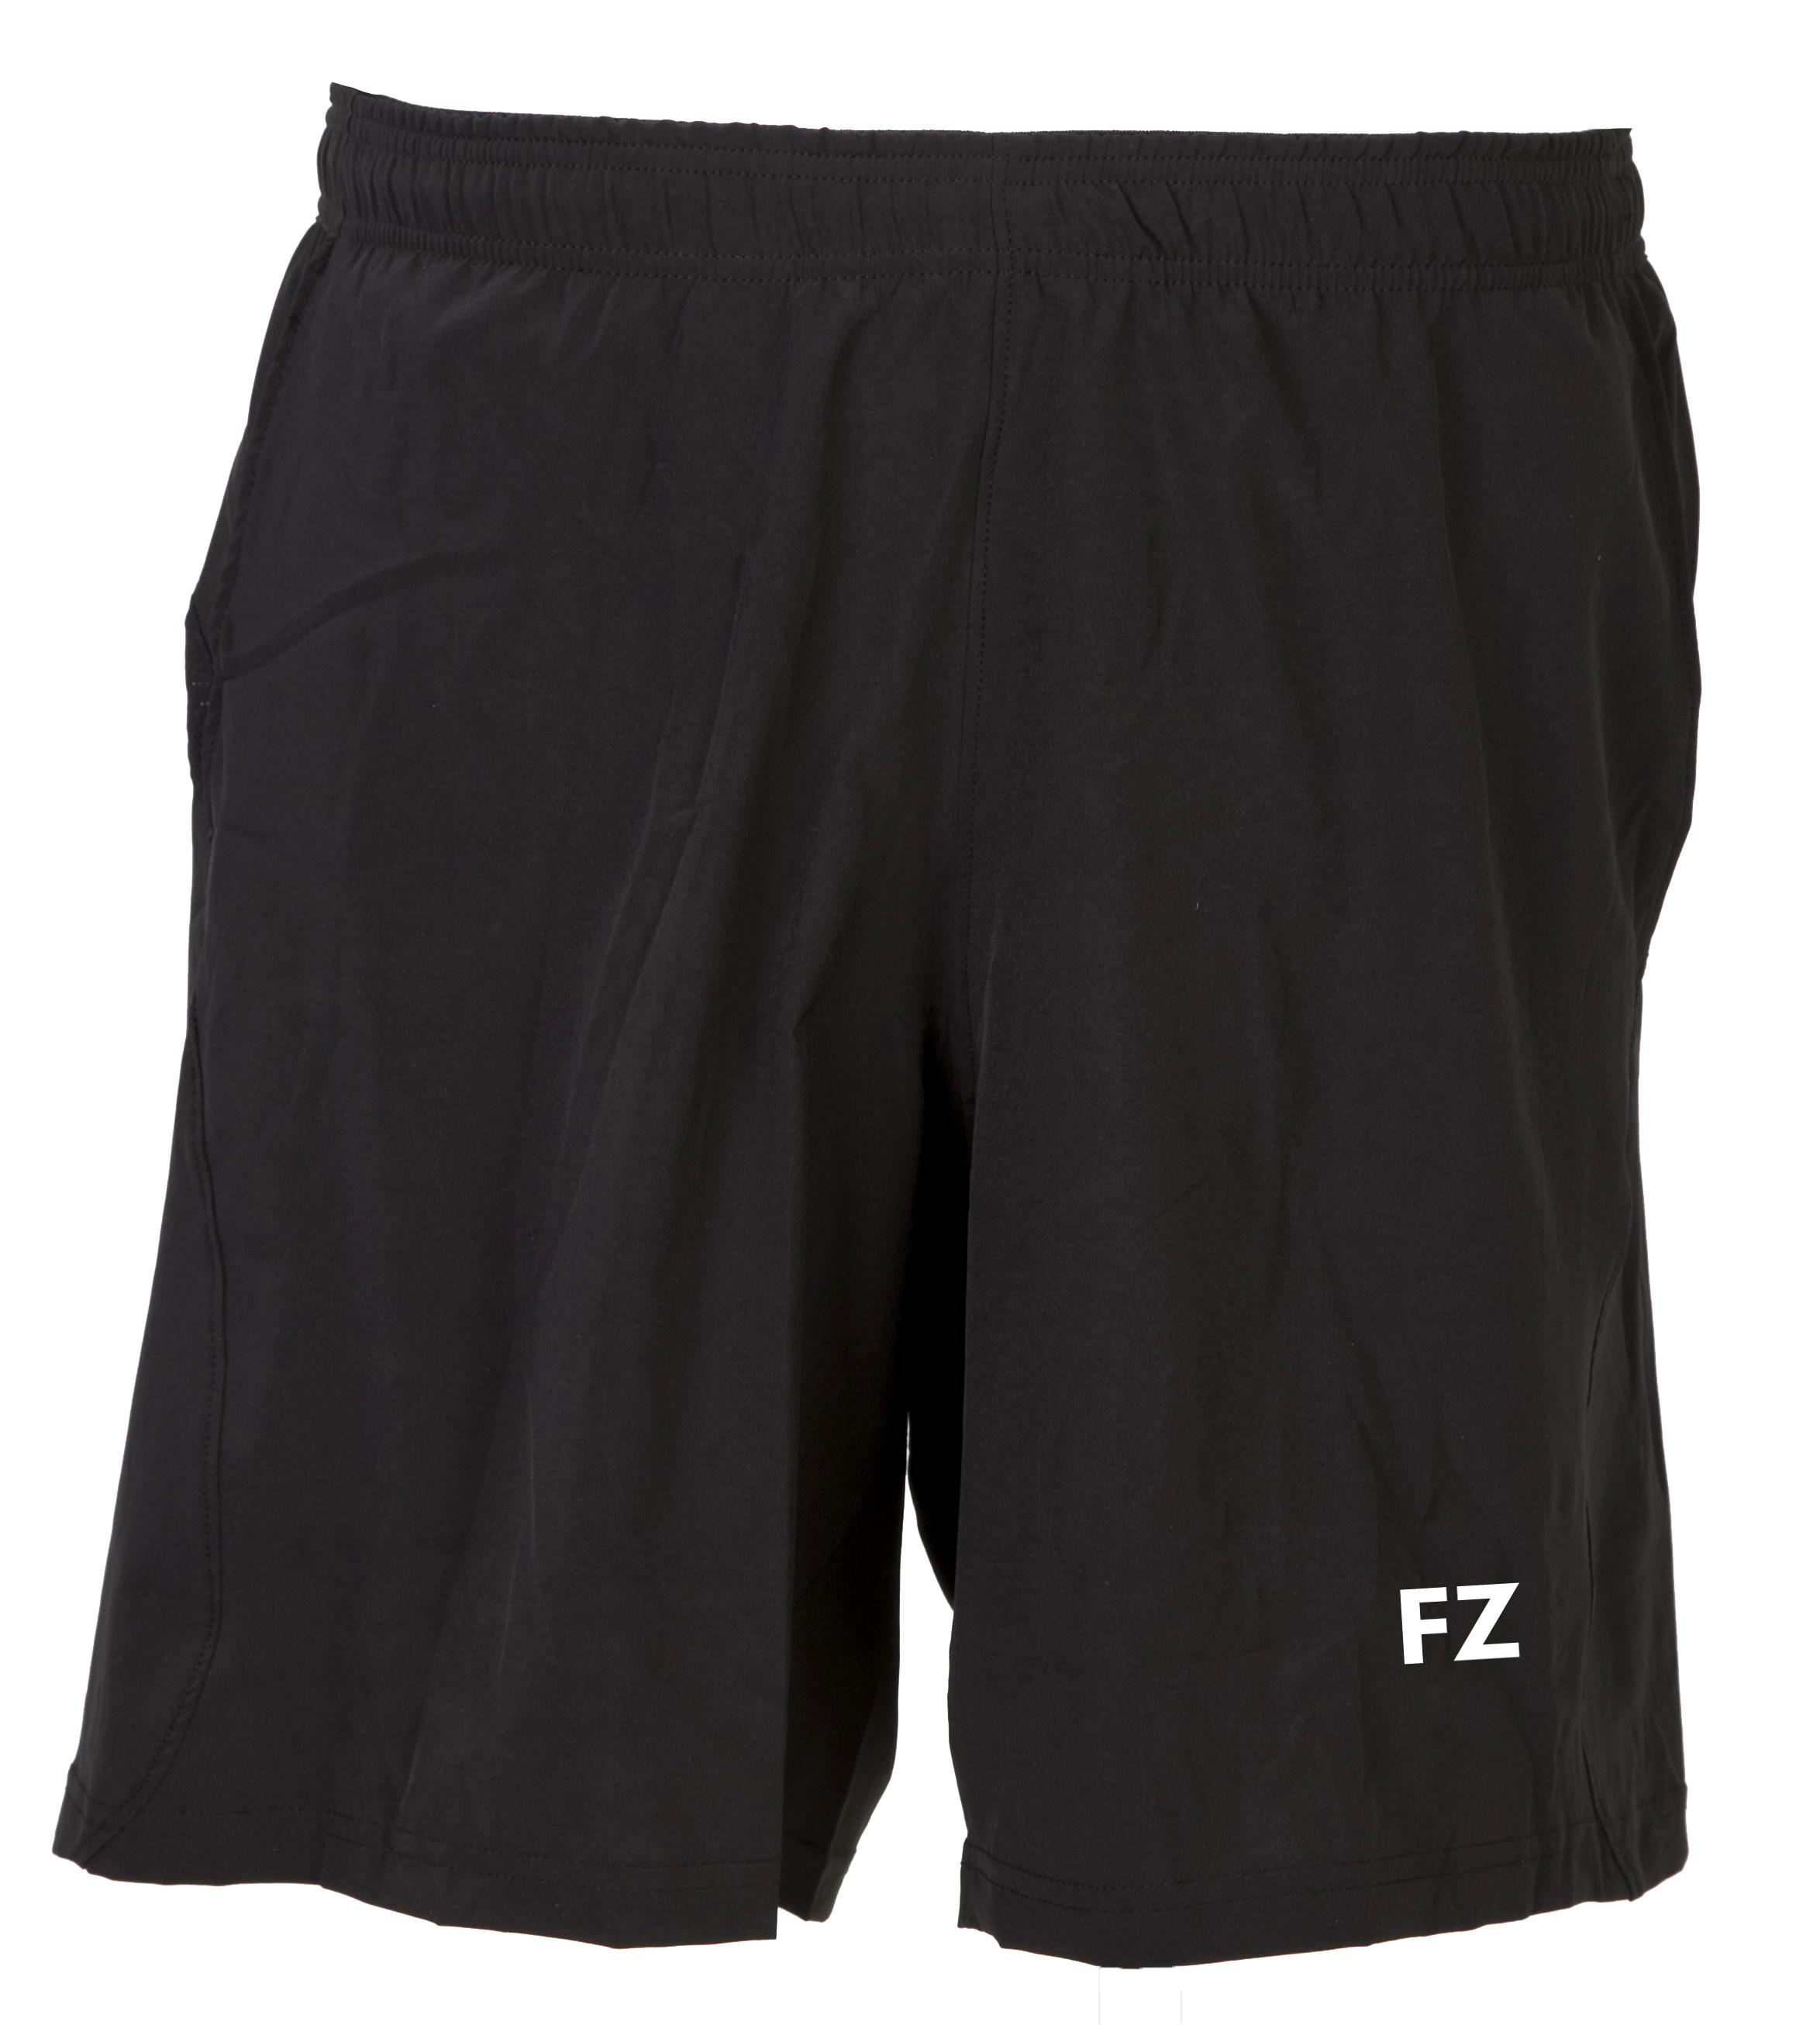 FZ Ajax shorts